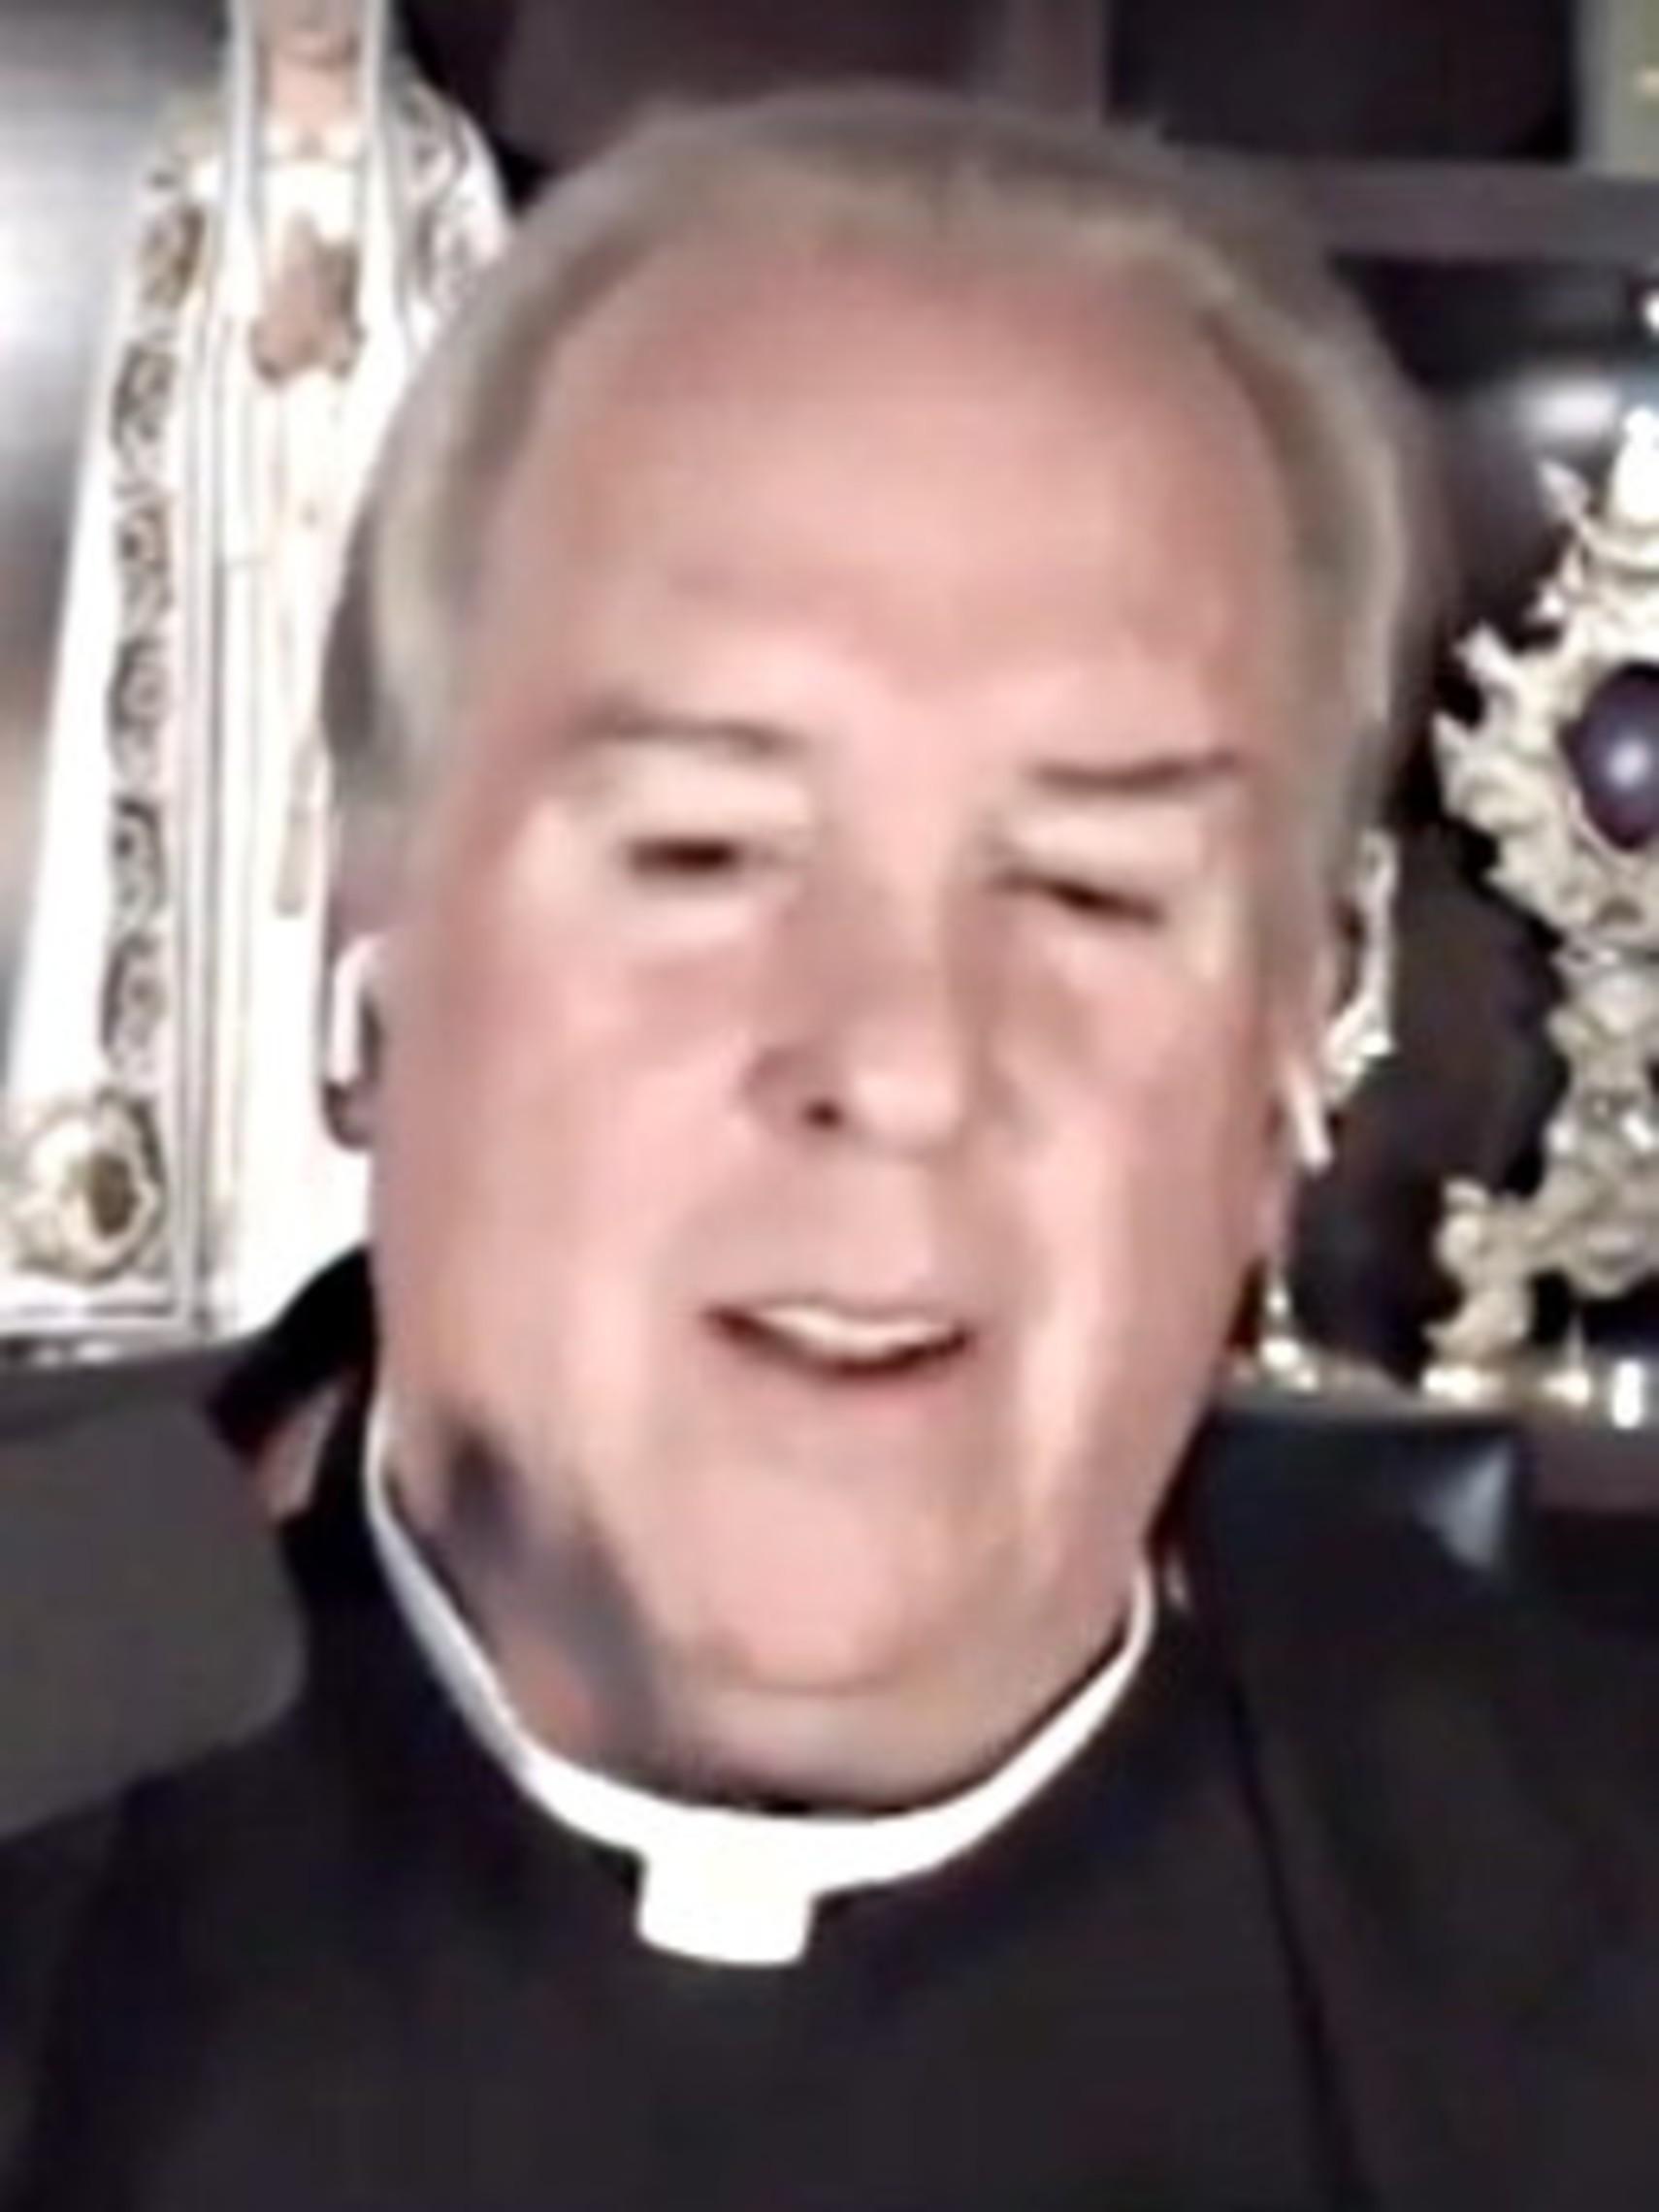 Fr. Richard Heilman